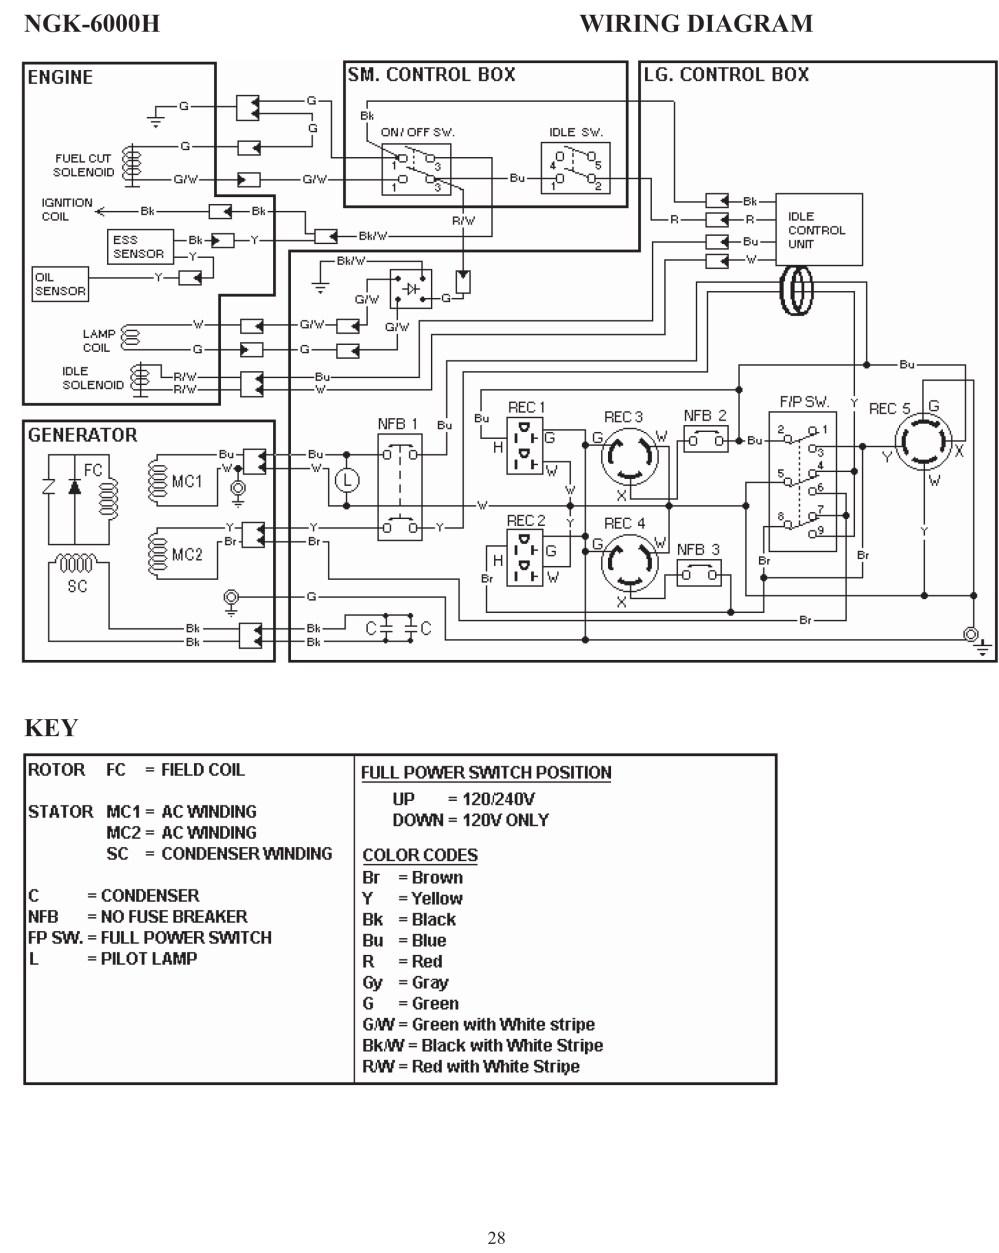 medium resolution of wiring diagram winnebago the wiring diagram southwind motorhome wiring diagram vidim wiring diagram wiring diagram